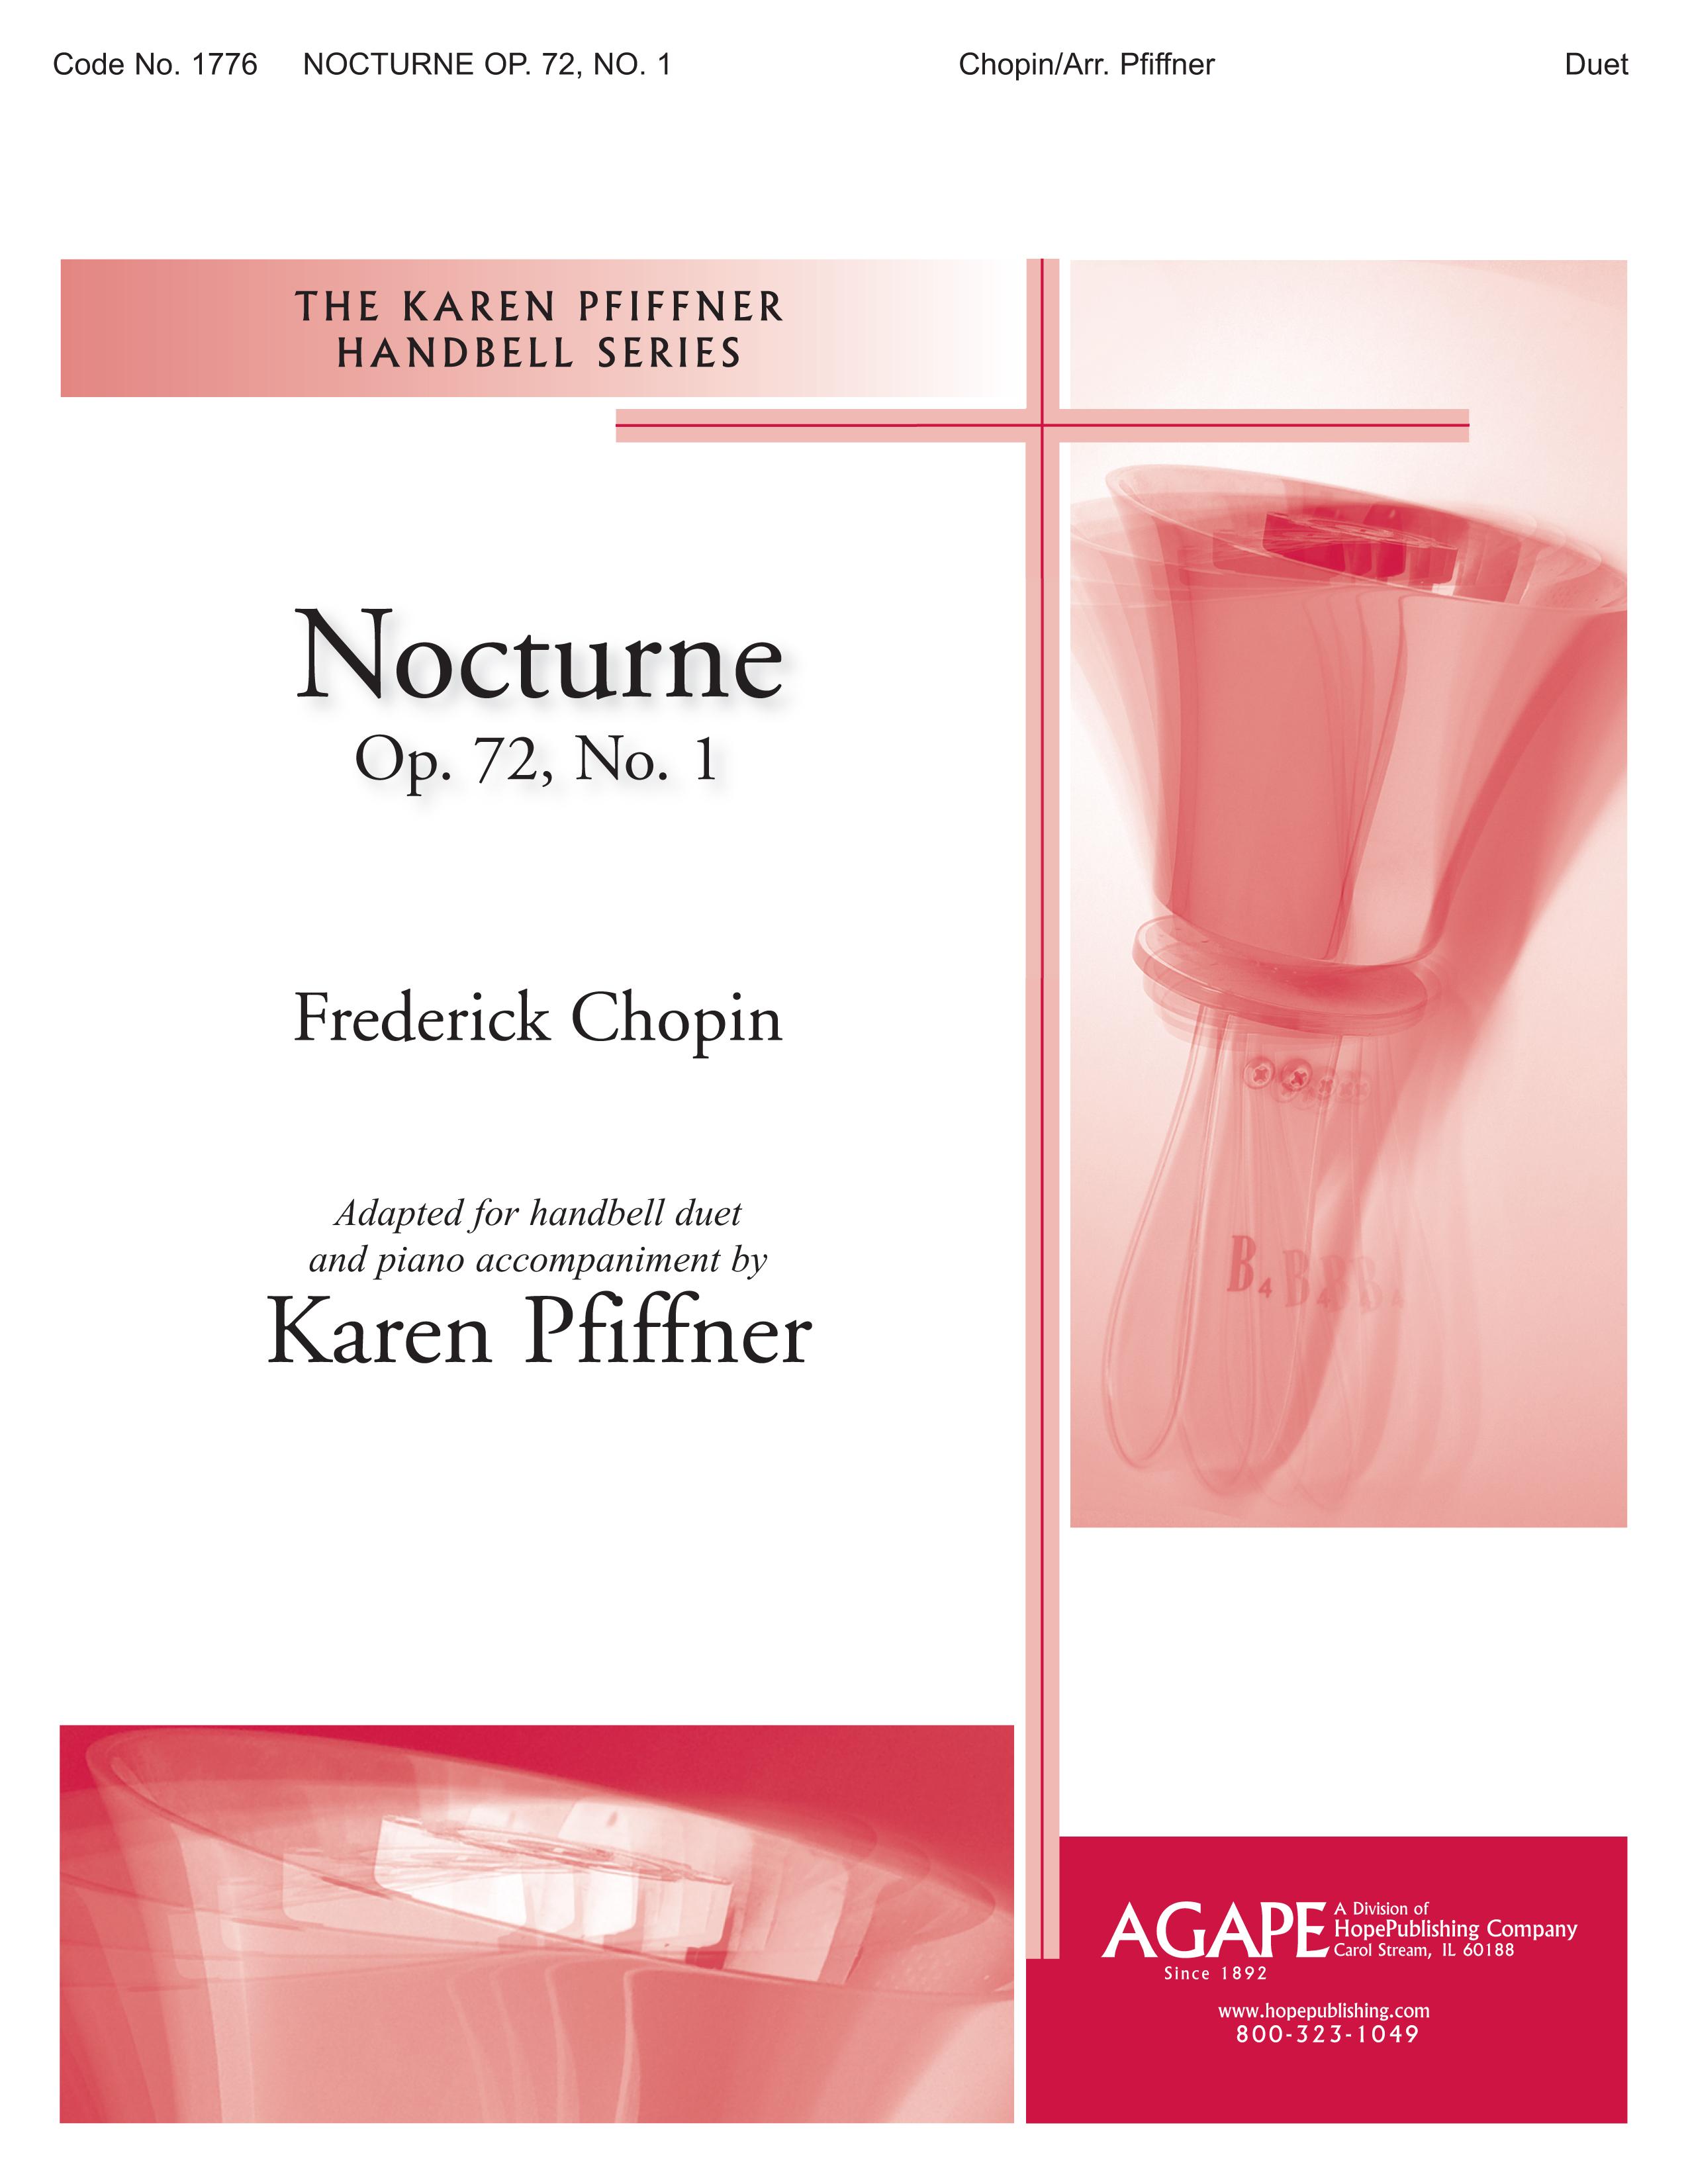 Nocturne Op. 72 No. 1 - Handbell Duet Cover Image